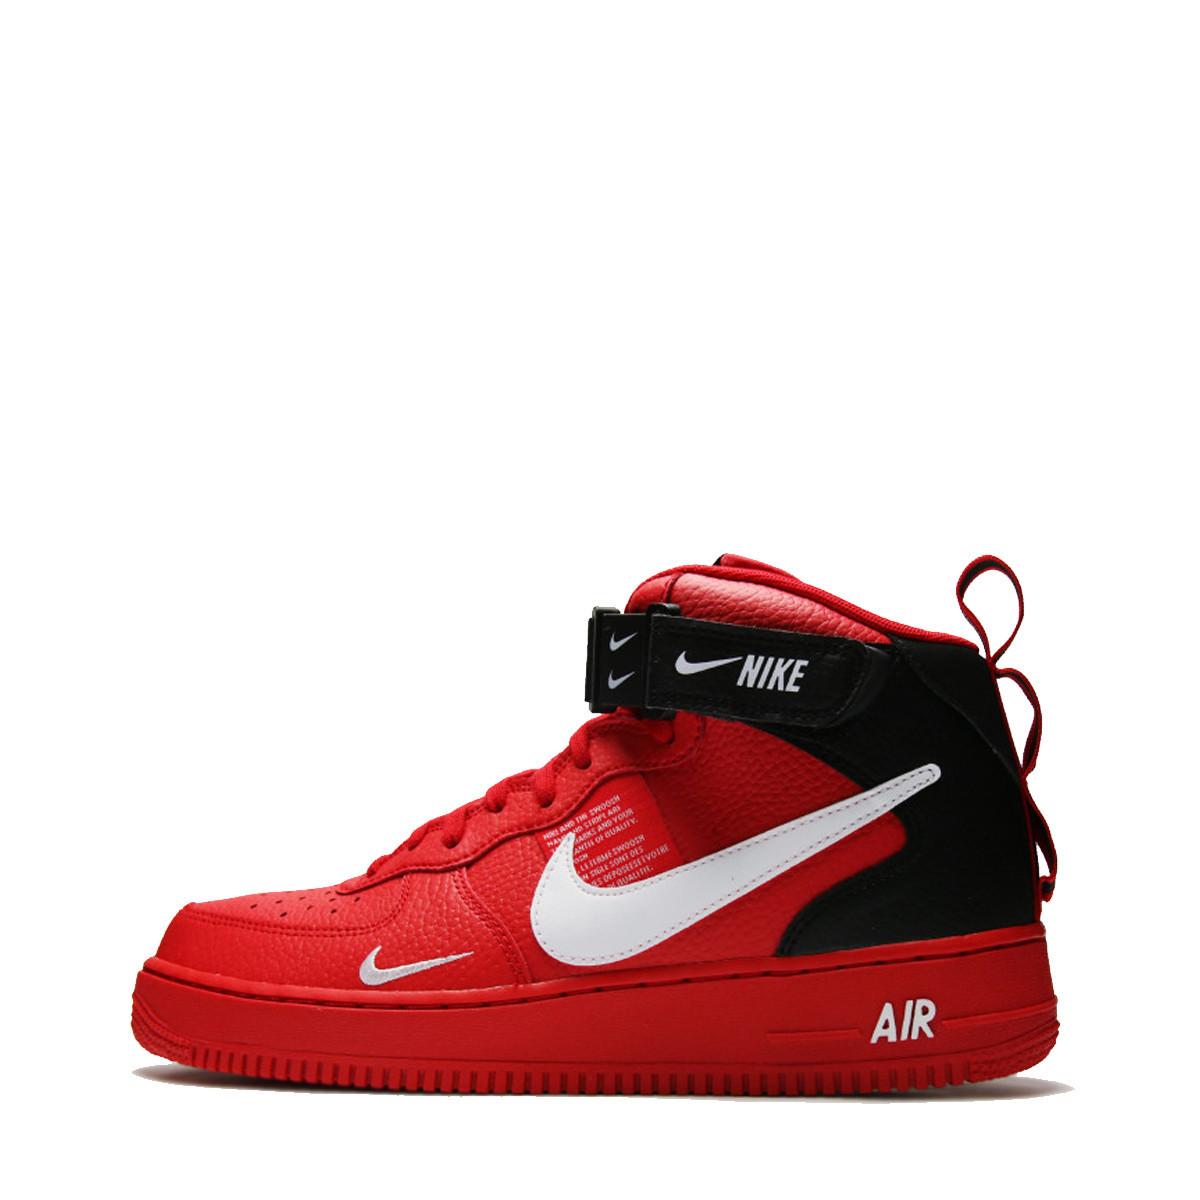 Nike Montante Montante Bateau Chaussure Chaussure Chaussure Nike Bateau Montante Nike Chaussure Bateau Nike Bateau O8nN0wvm